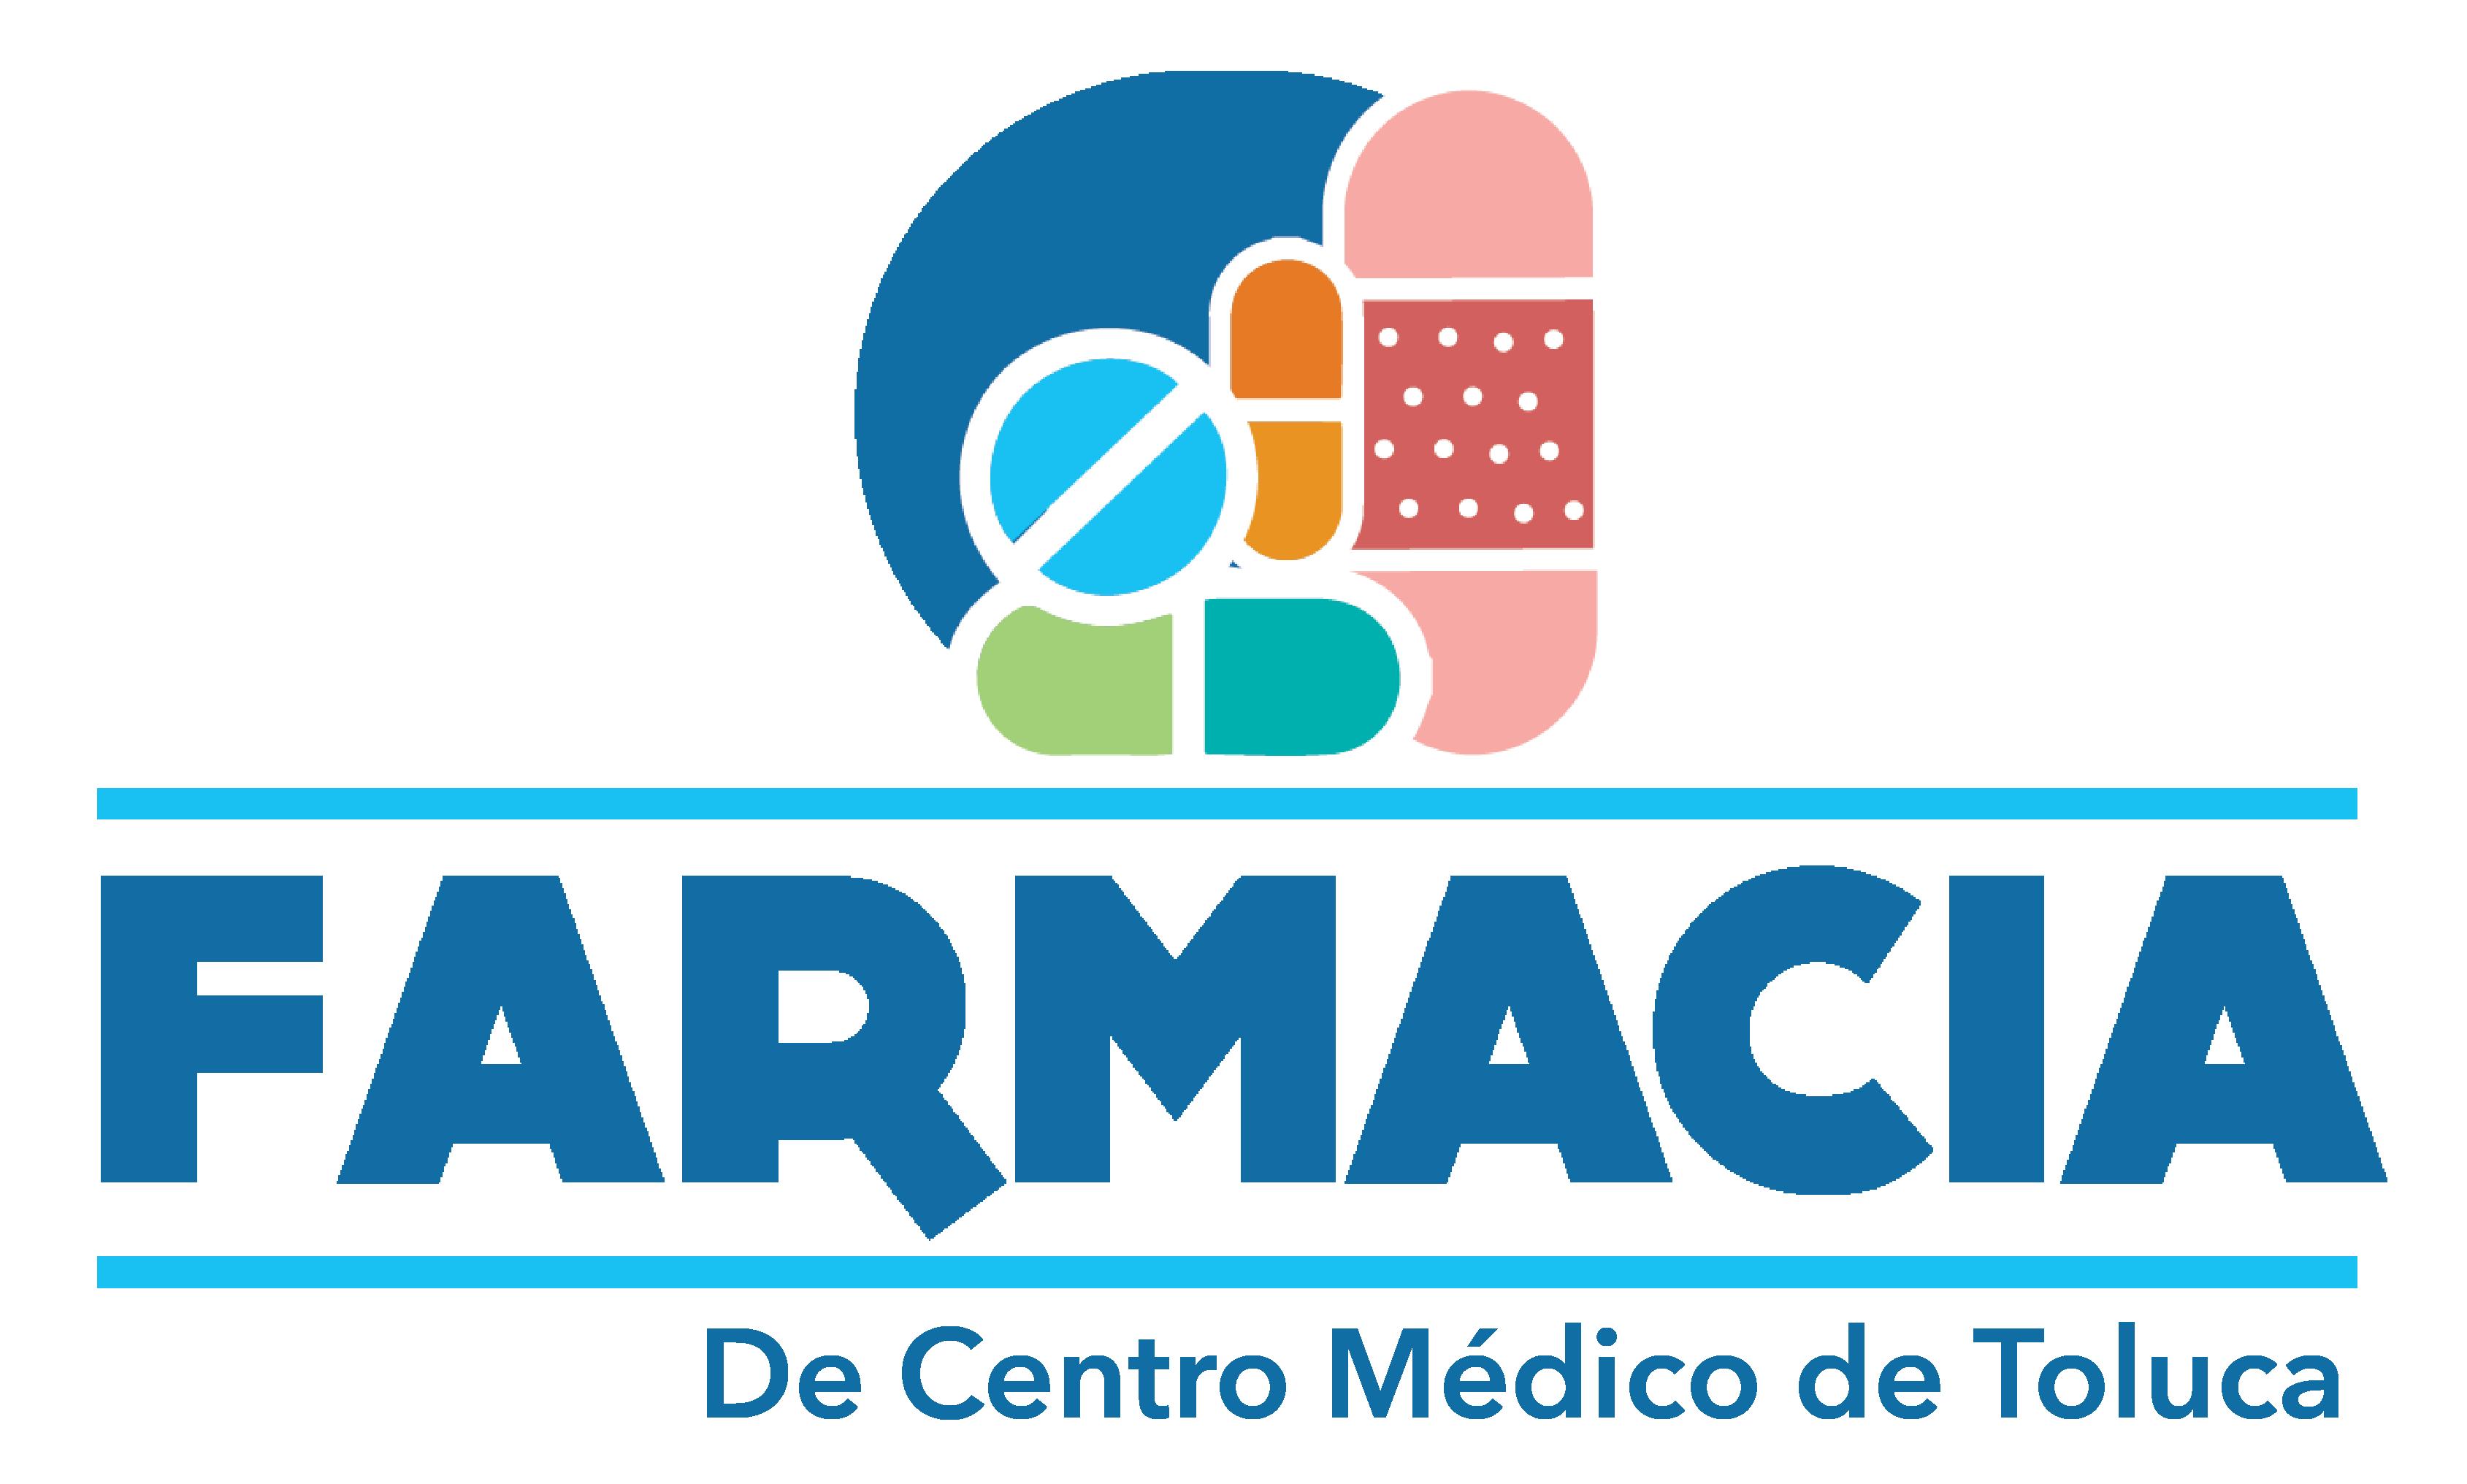 Farmacia - Centro Medico de Toluca